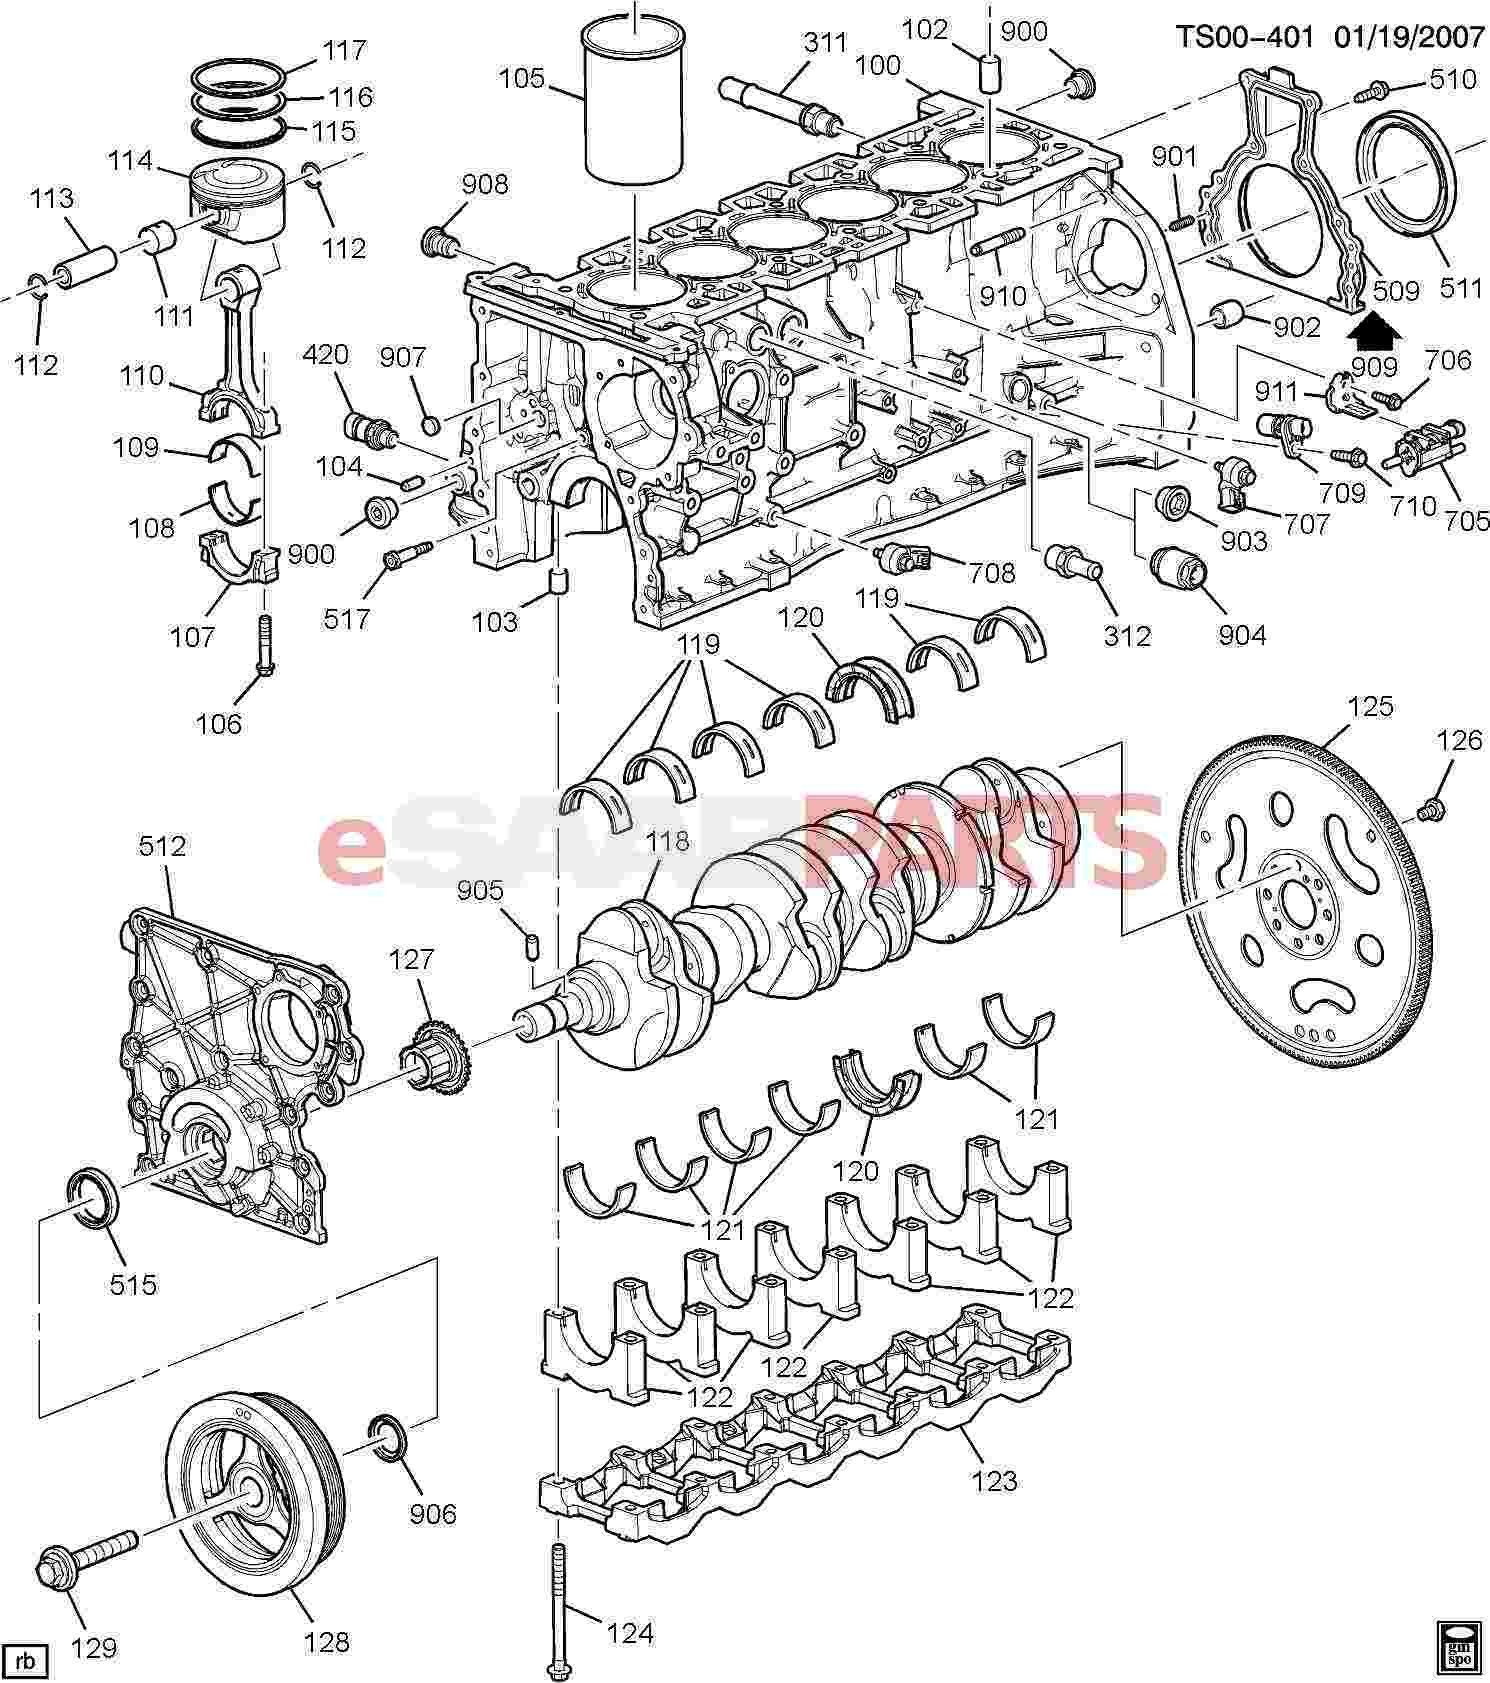 Gmc Yukon Parts Diagram ] Saab Plug M16x1 5×14 24 Od society Automotive Of Gmc Yukon Parts Diagram